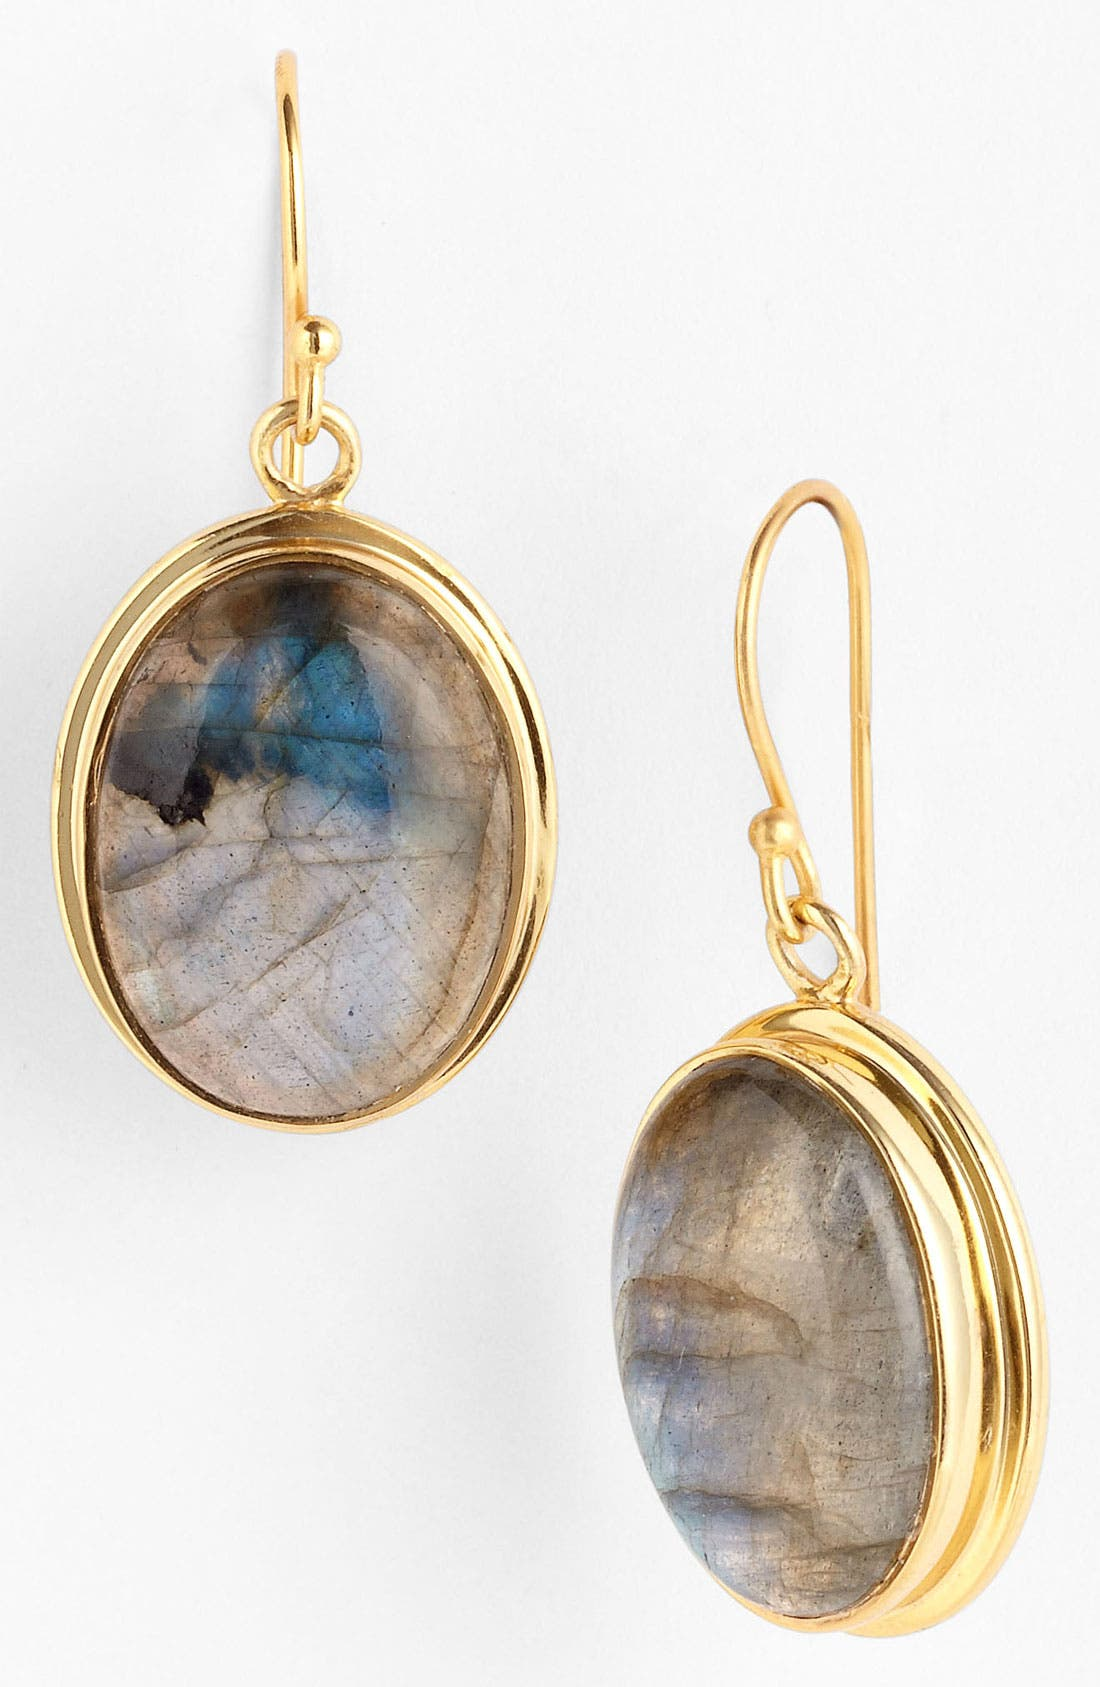 Alternate Image 1 Selected - Argento Vivo Drop Earrings (Nordstrom Exclusive)